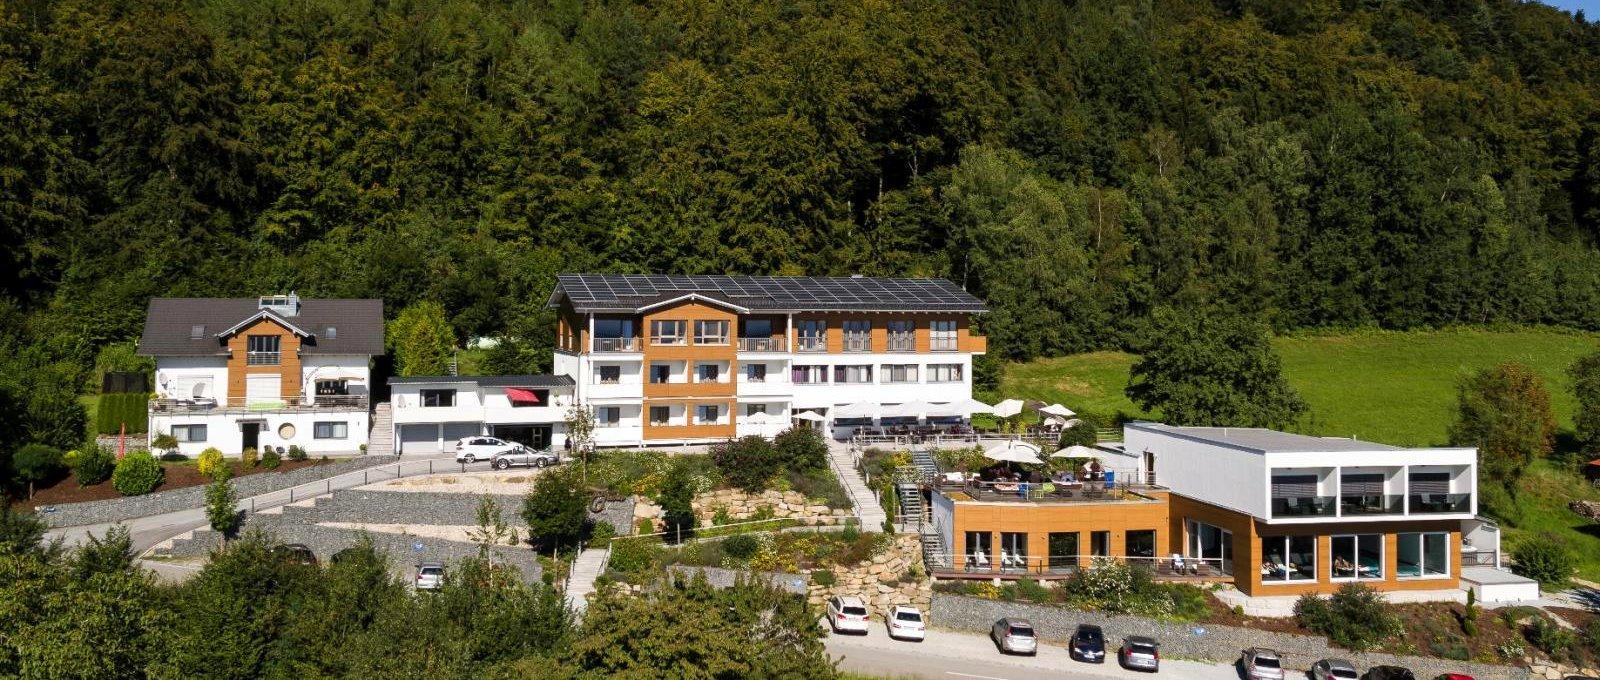 Bayerischer Wald Wellnesshotel Thula Landkarte Lalling